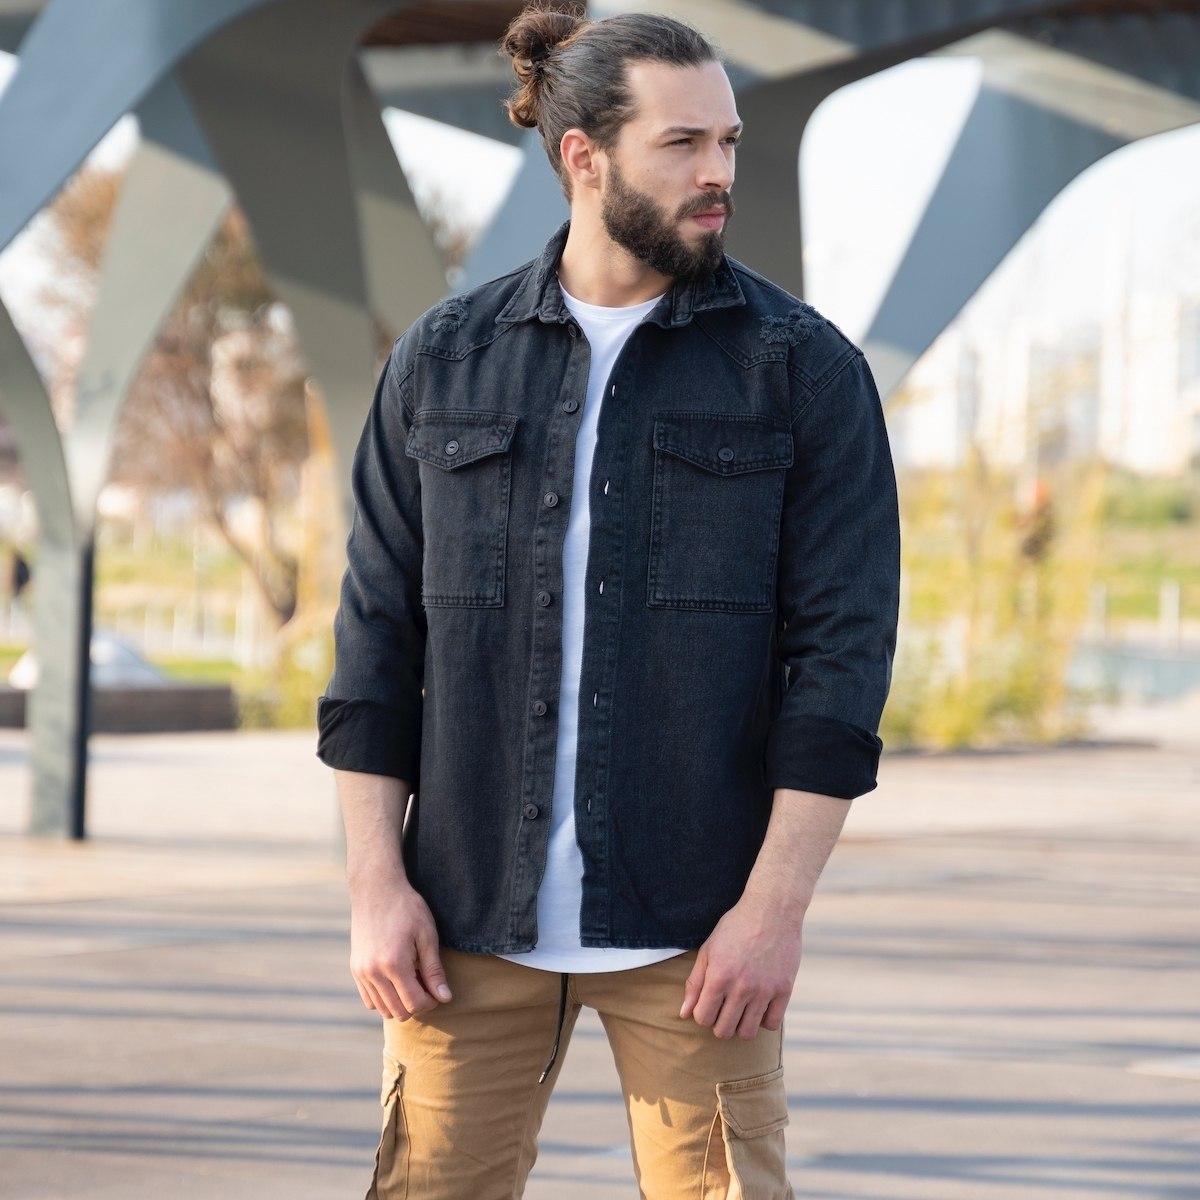 Men's Denim Shirt In Black